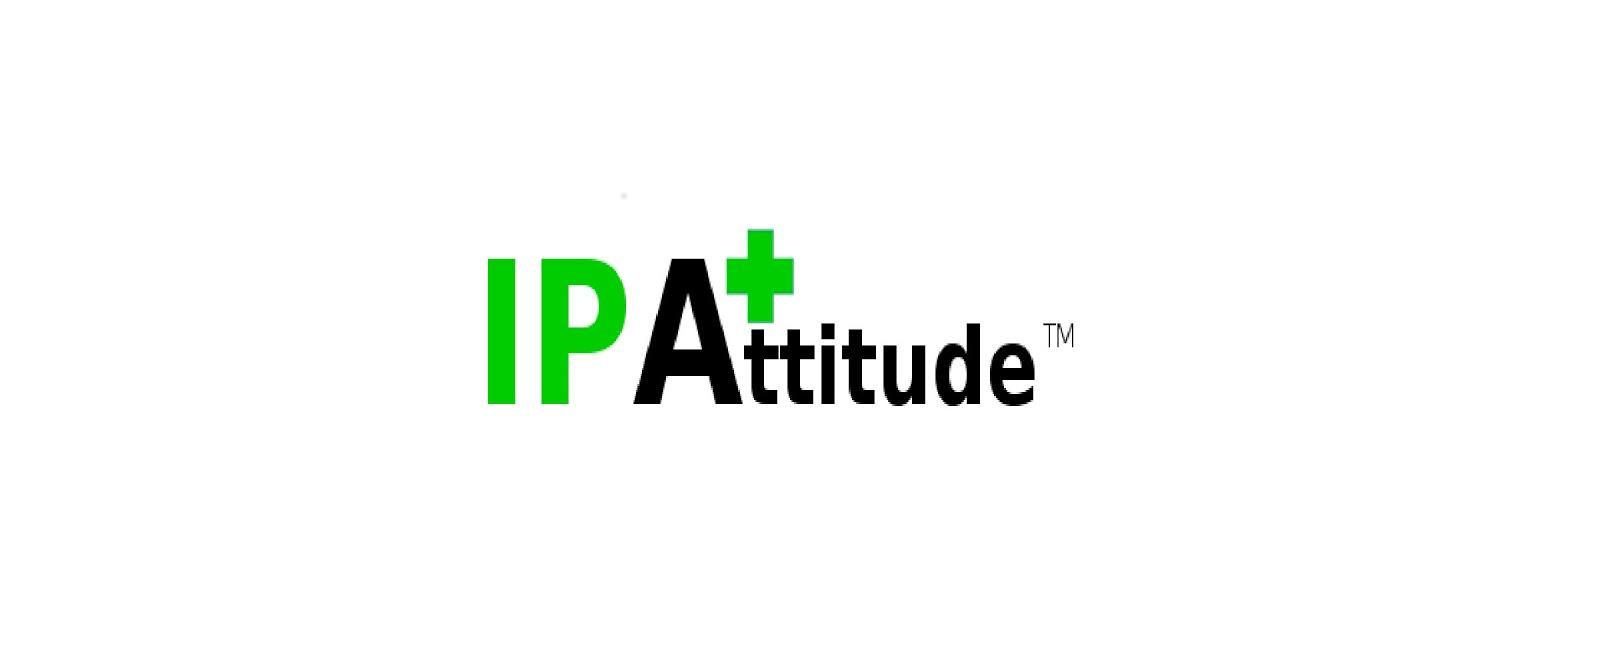 www.ipattitude.com